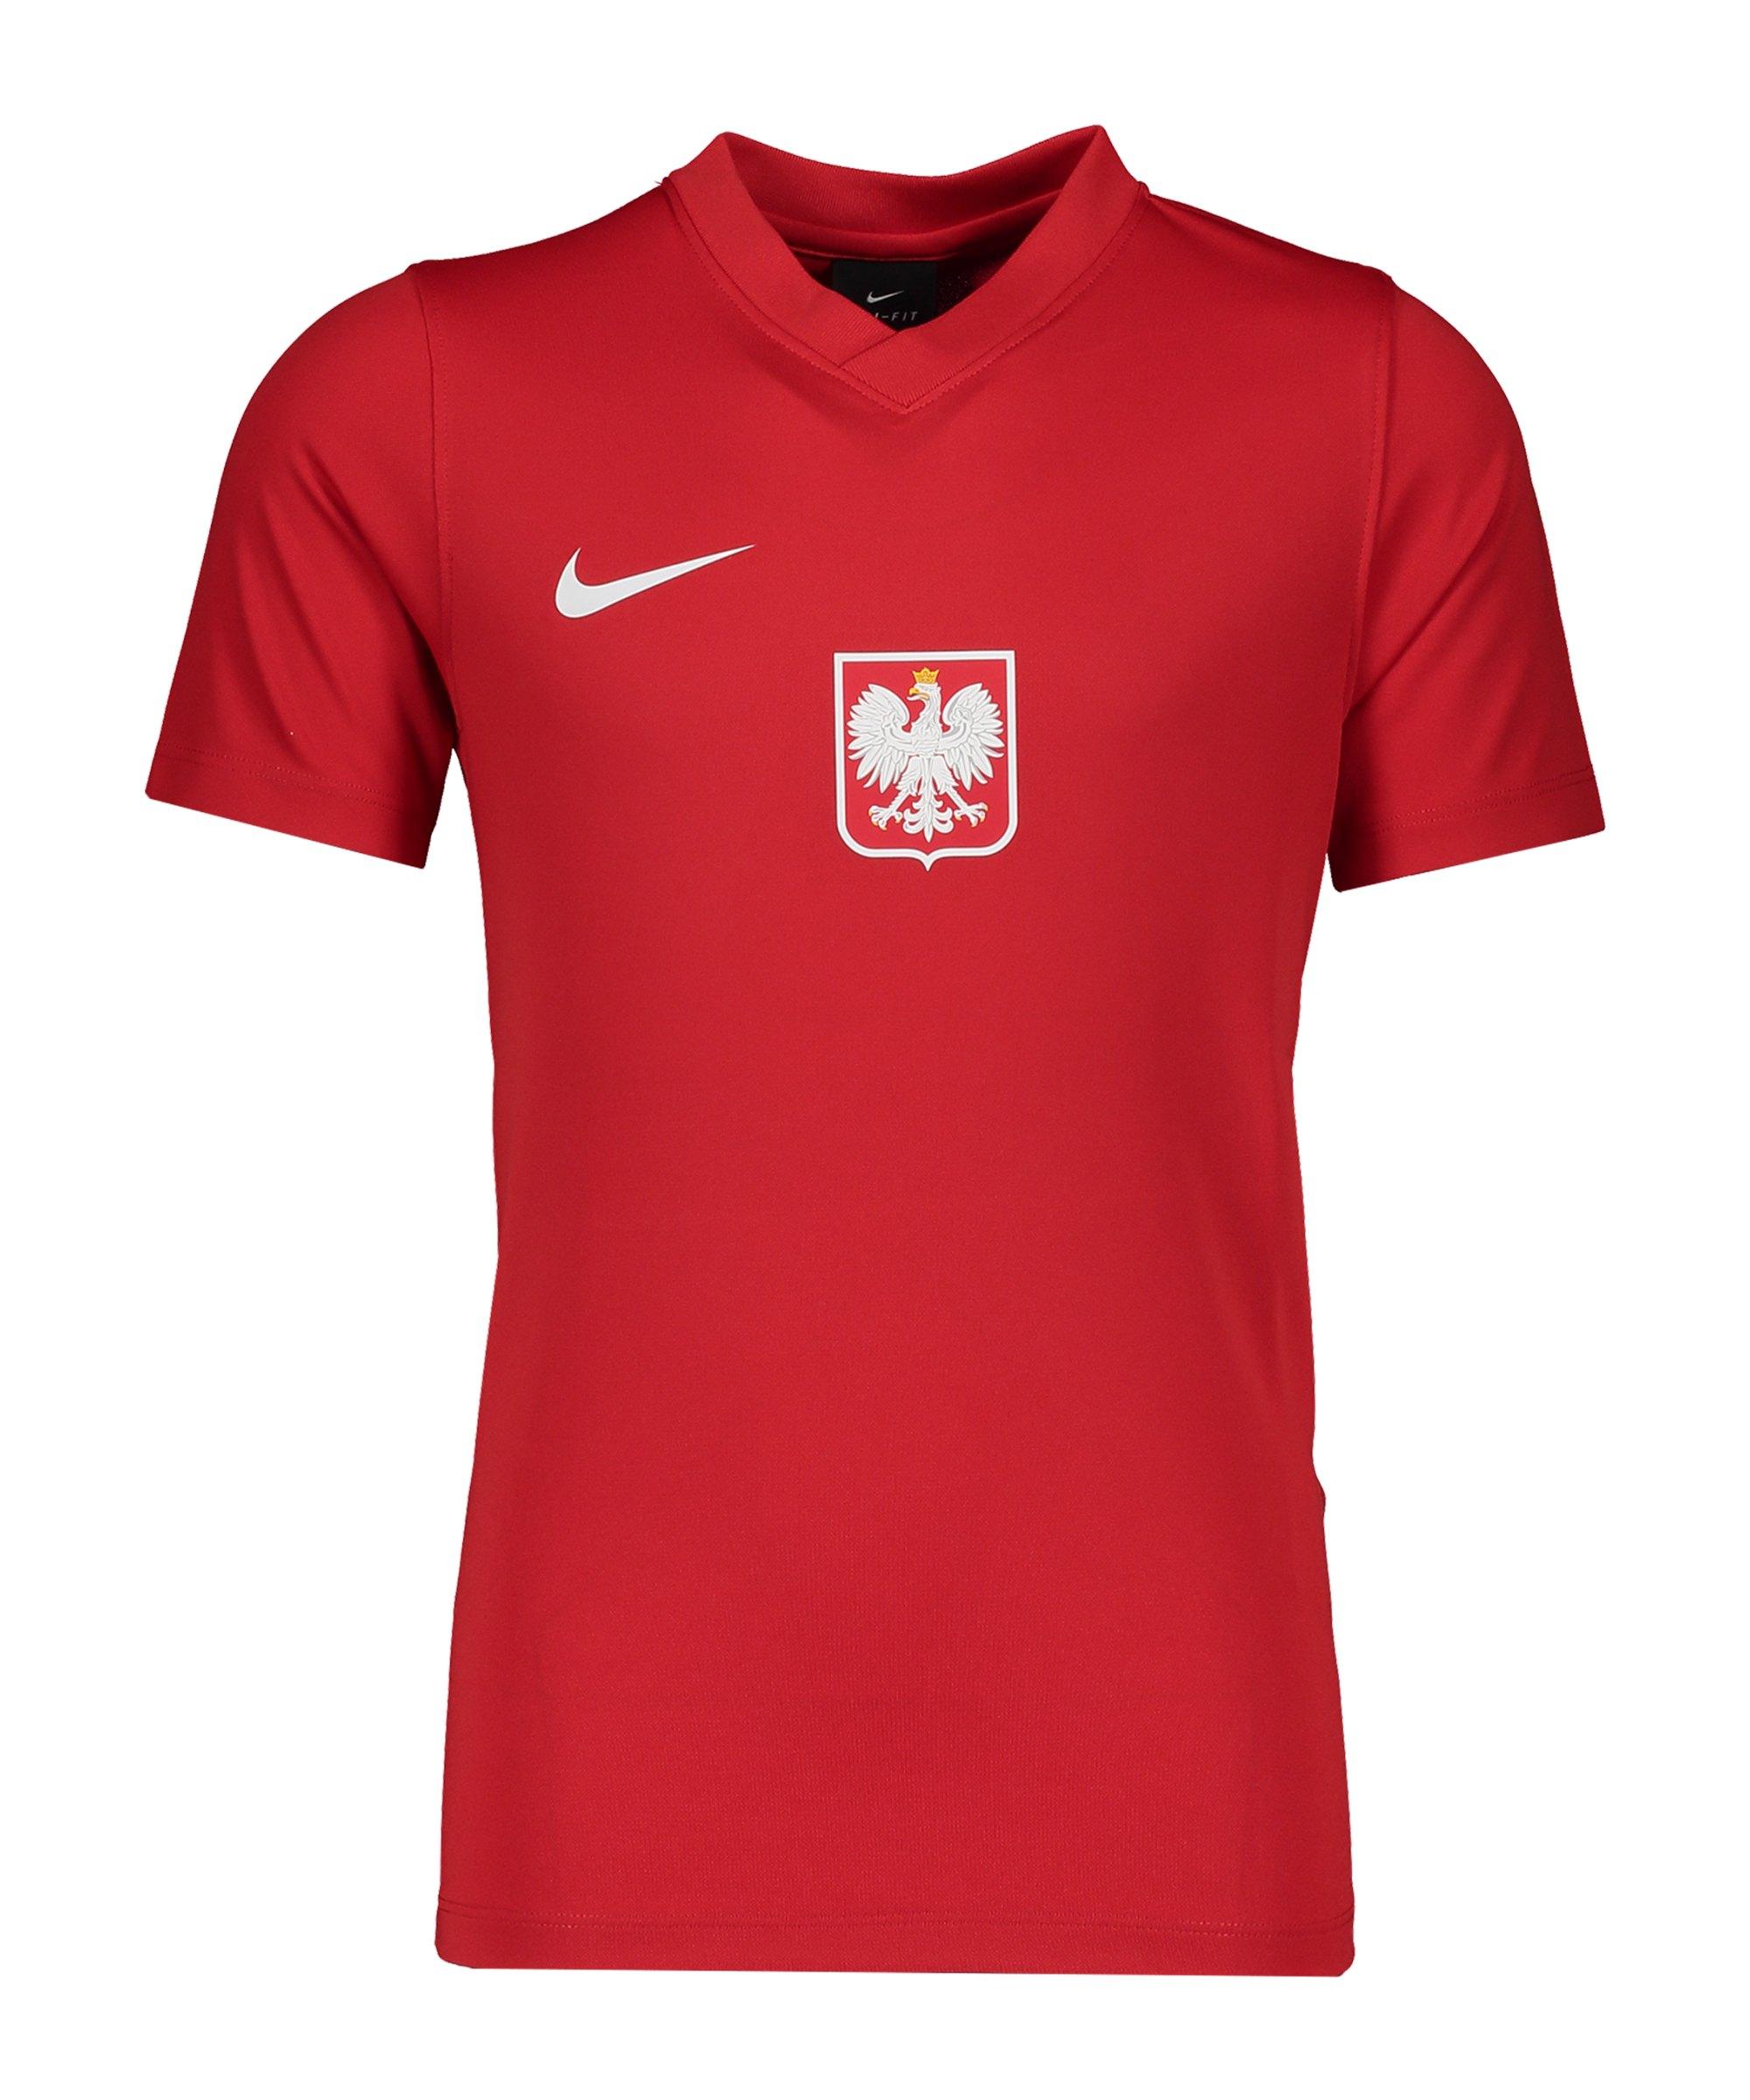 Nike Polen Trainingstop kurzarm Kids Rot F688 - rot